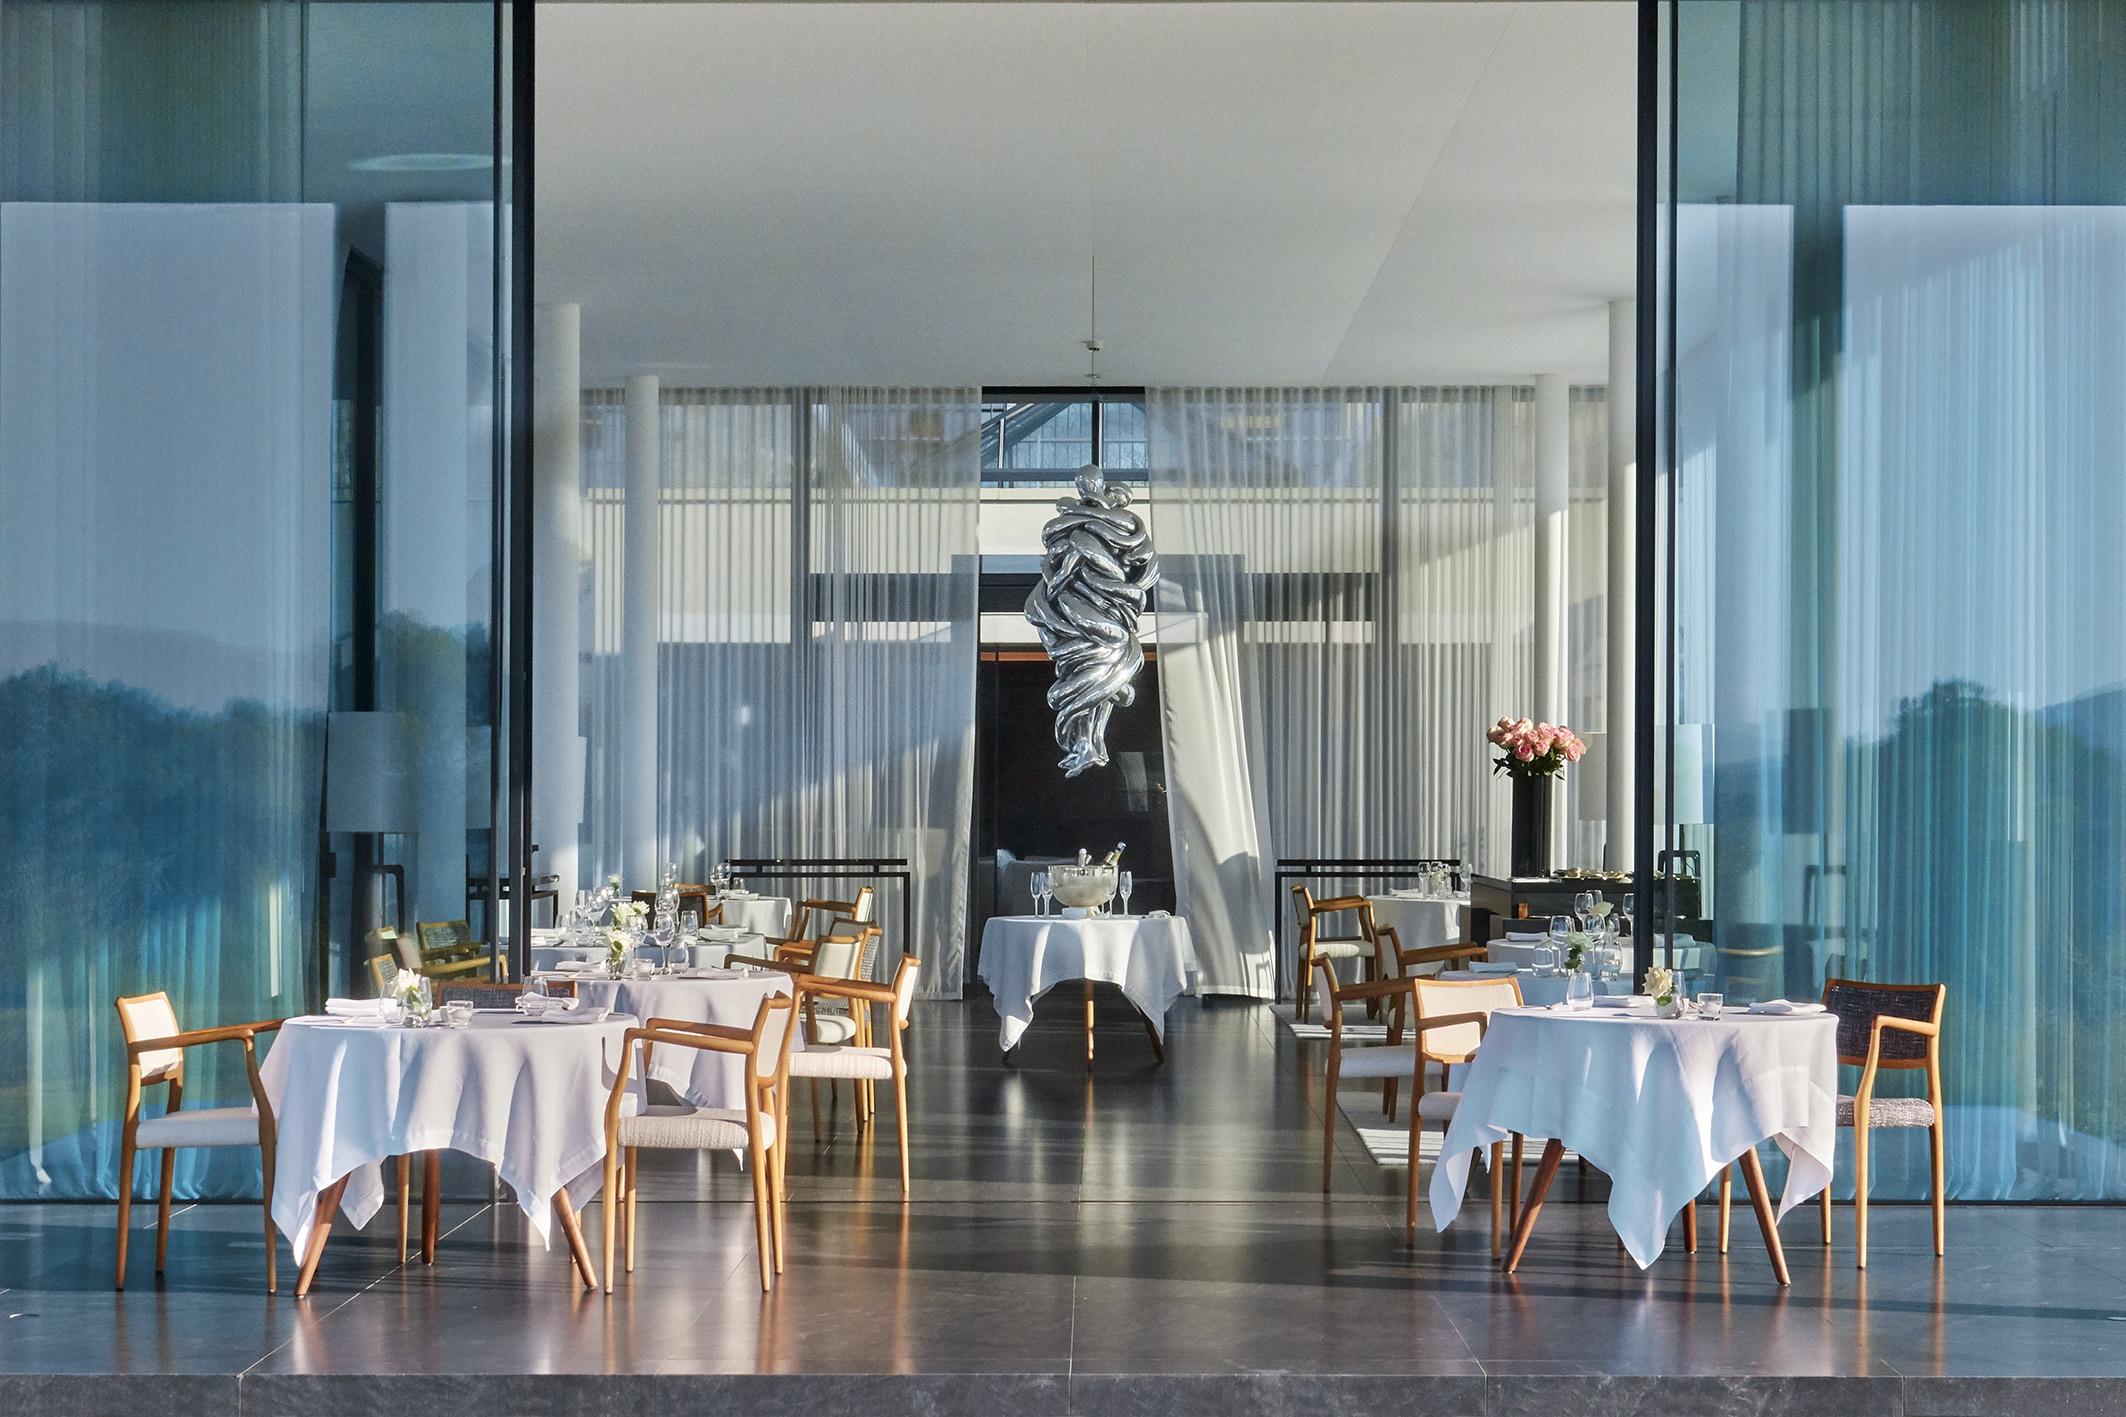 Restaurant gastronomique en provence h tel de luxe villa la coste - Lycee viala lacoste salon de provence ...